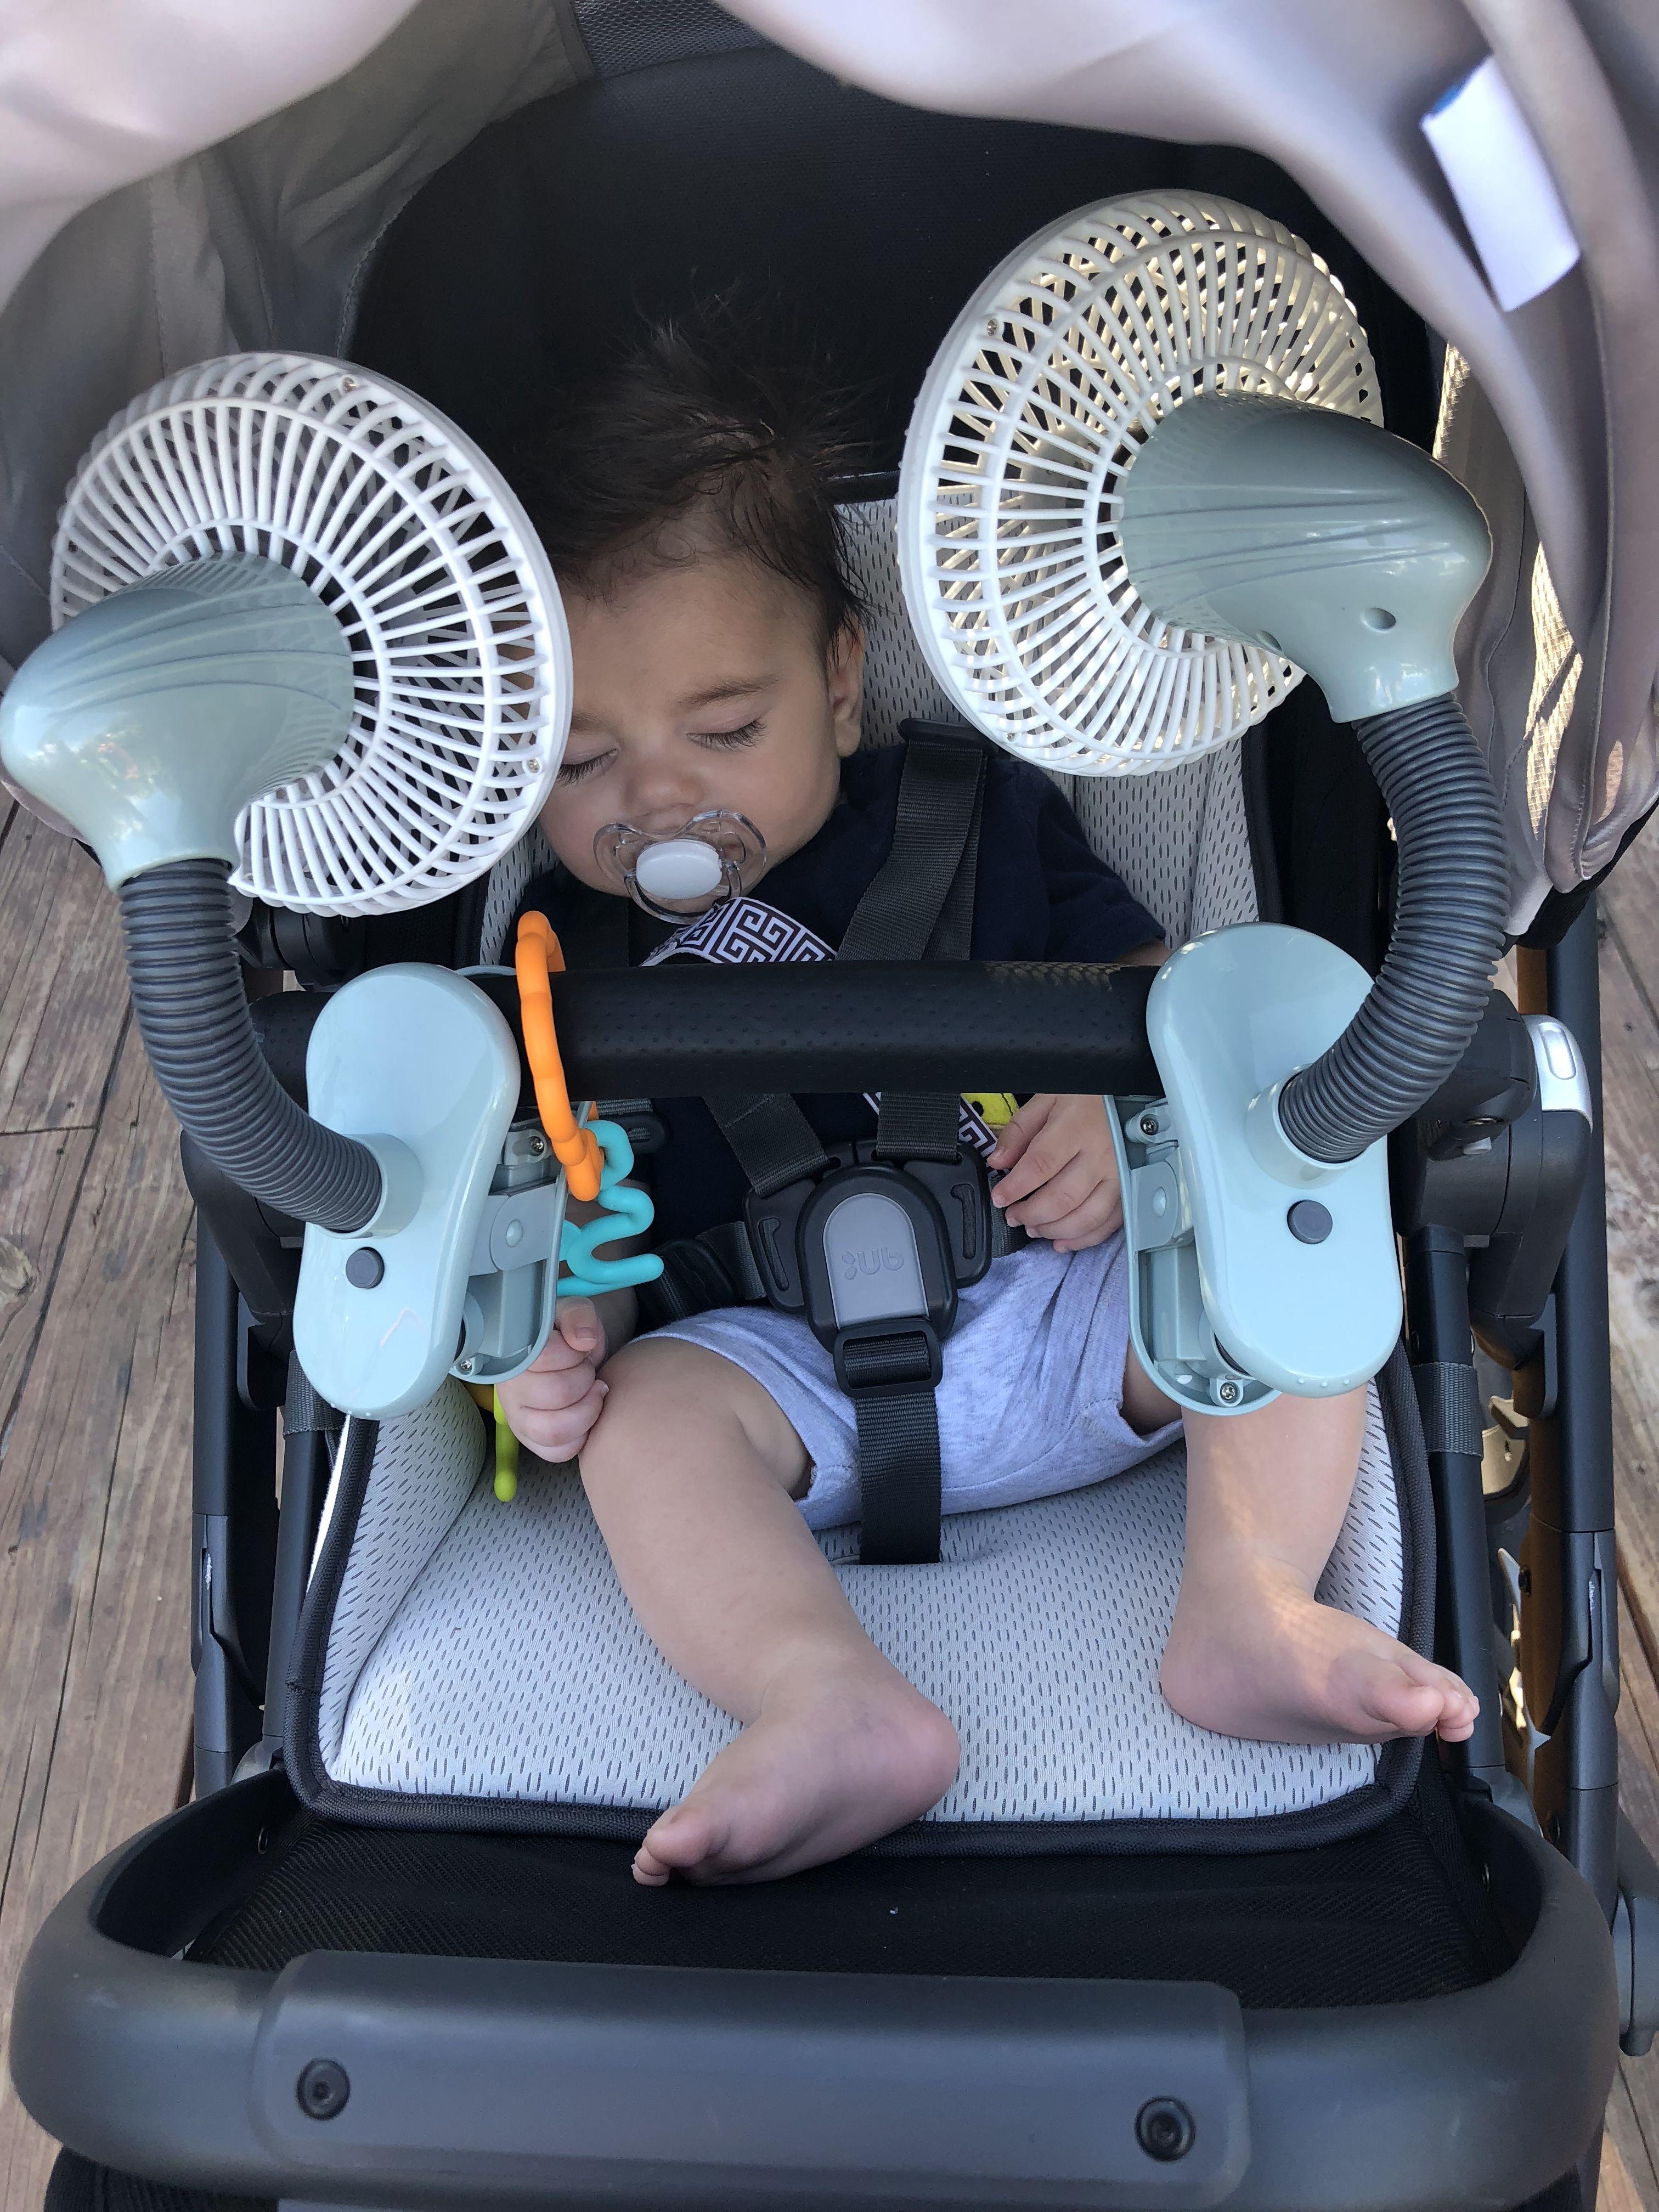 Beating the heat! | Summertime | Pinterest | Summertime